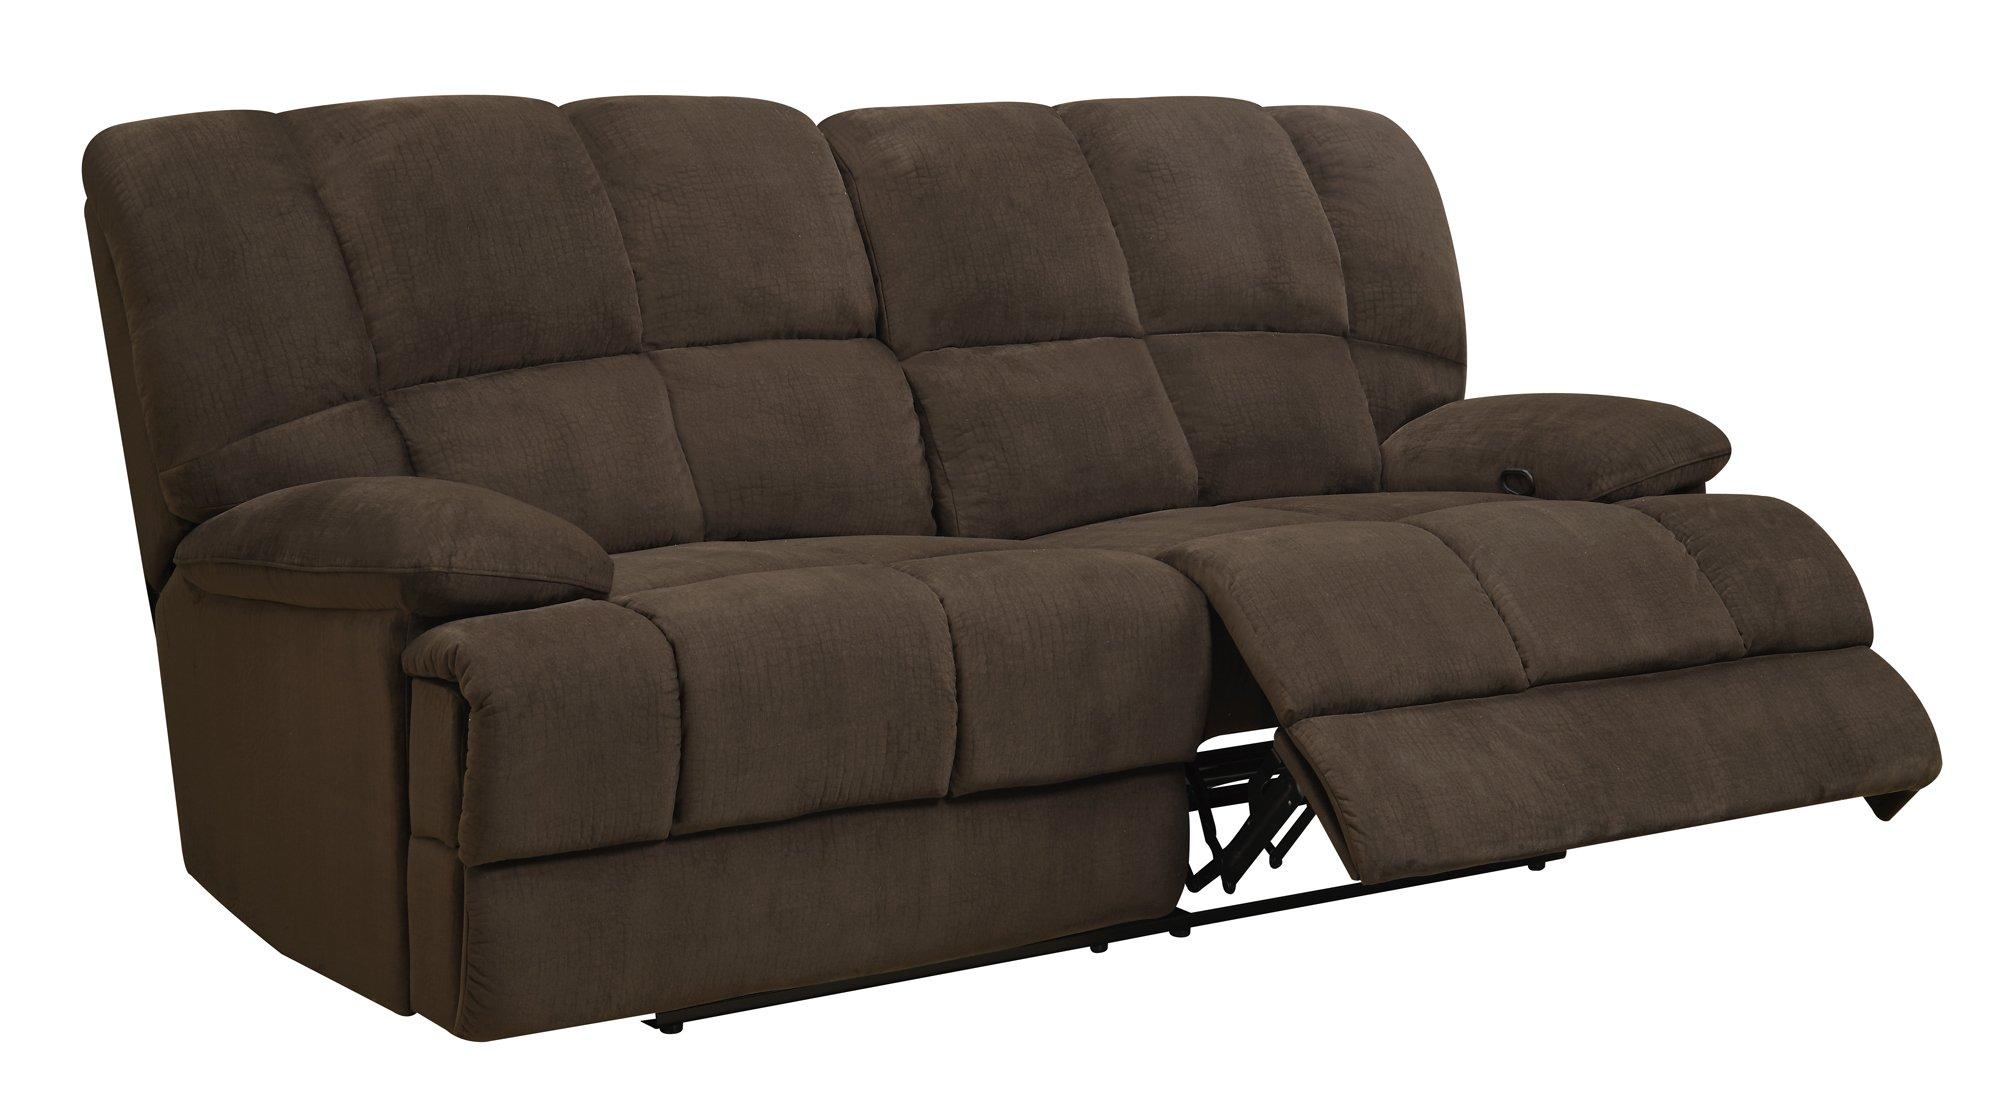 U201 Chocolate Fabric Reclining Sofa by Global Furniture